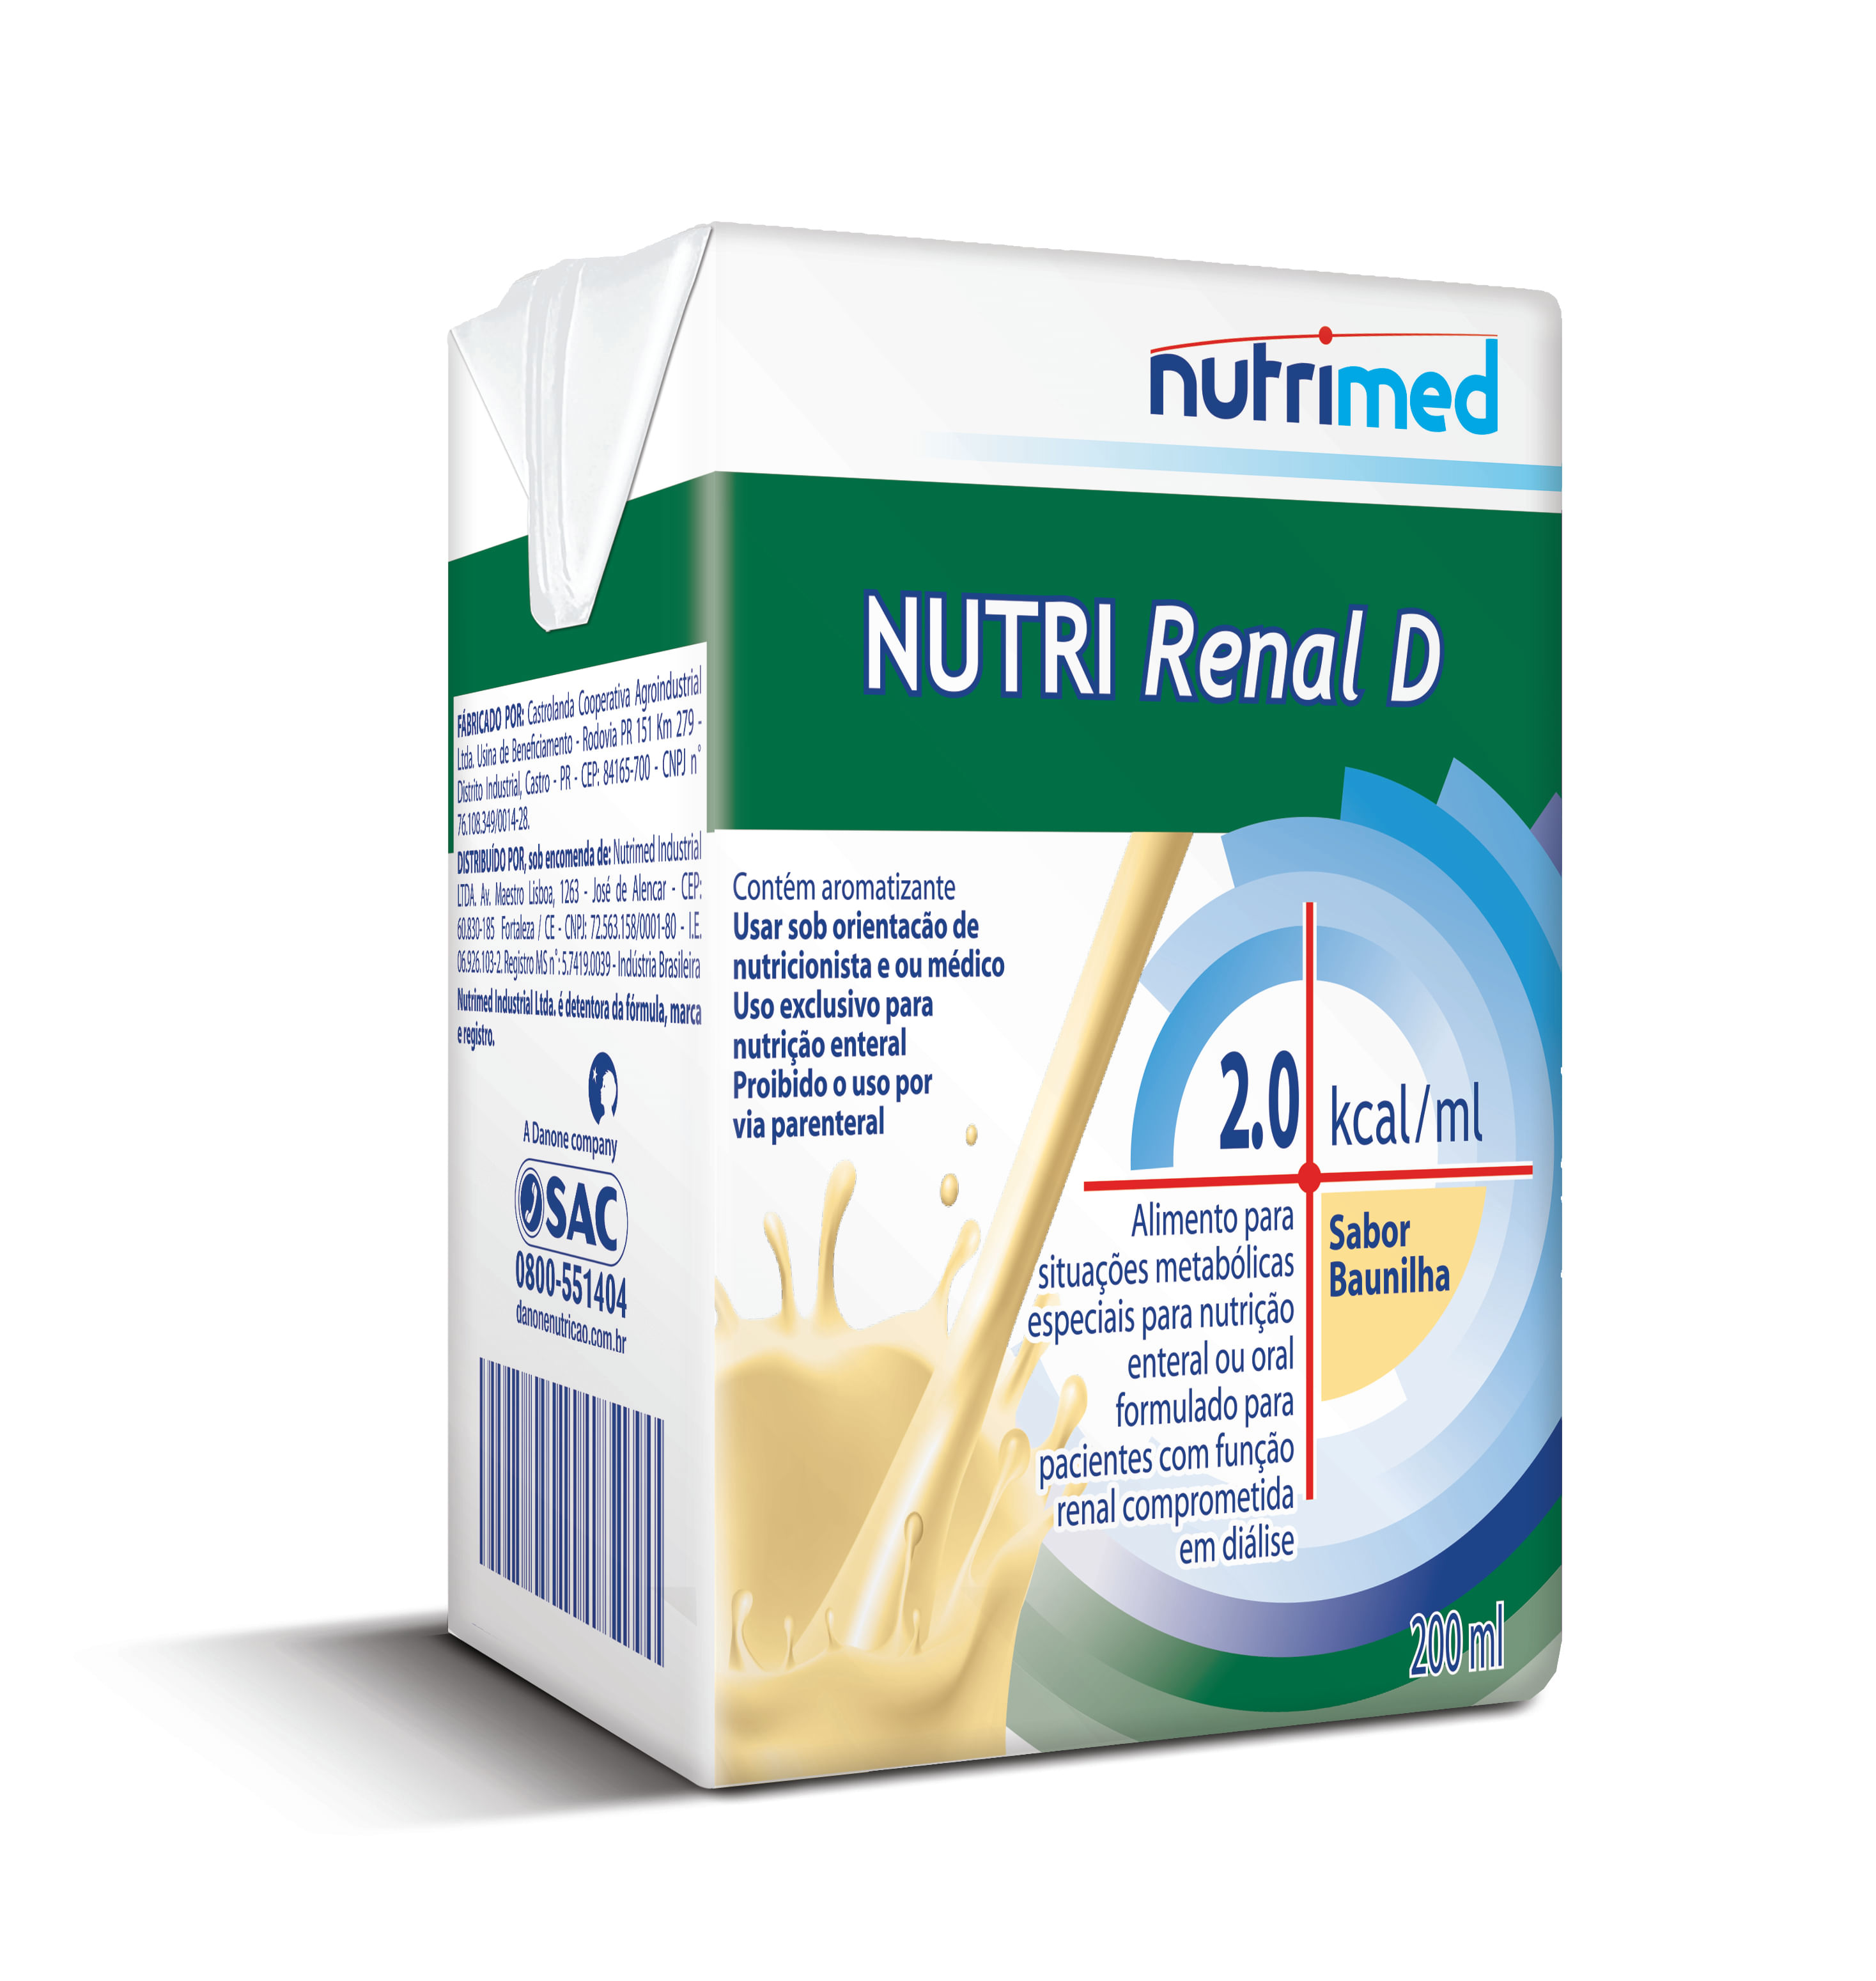 NUTRIMED-mockup-200ML-RENAL-D